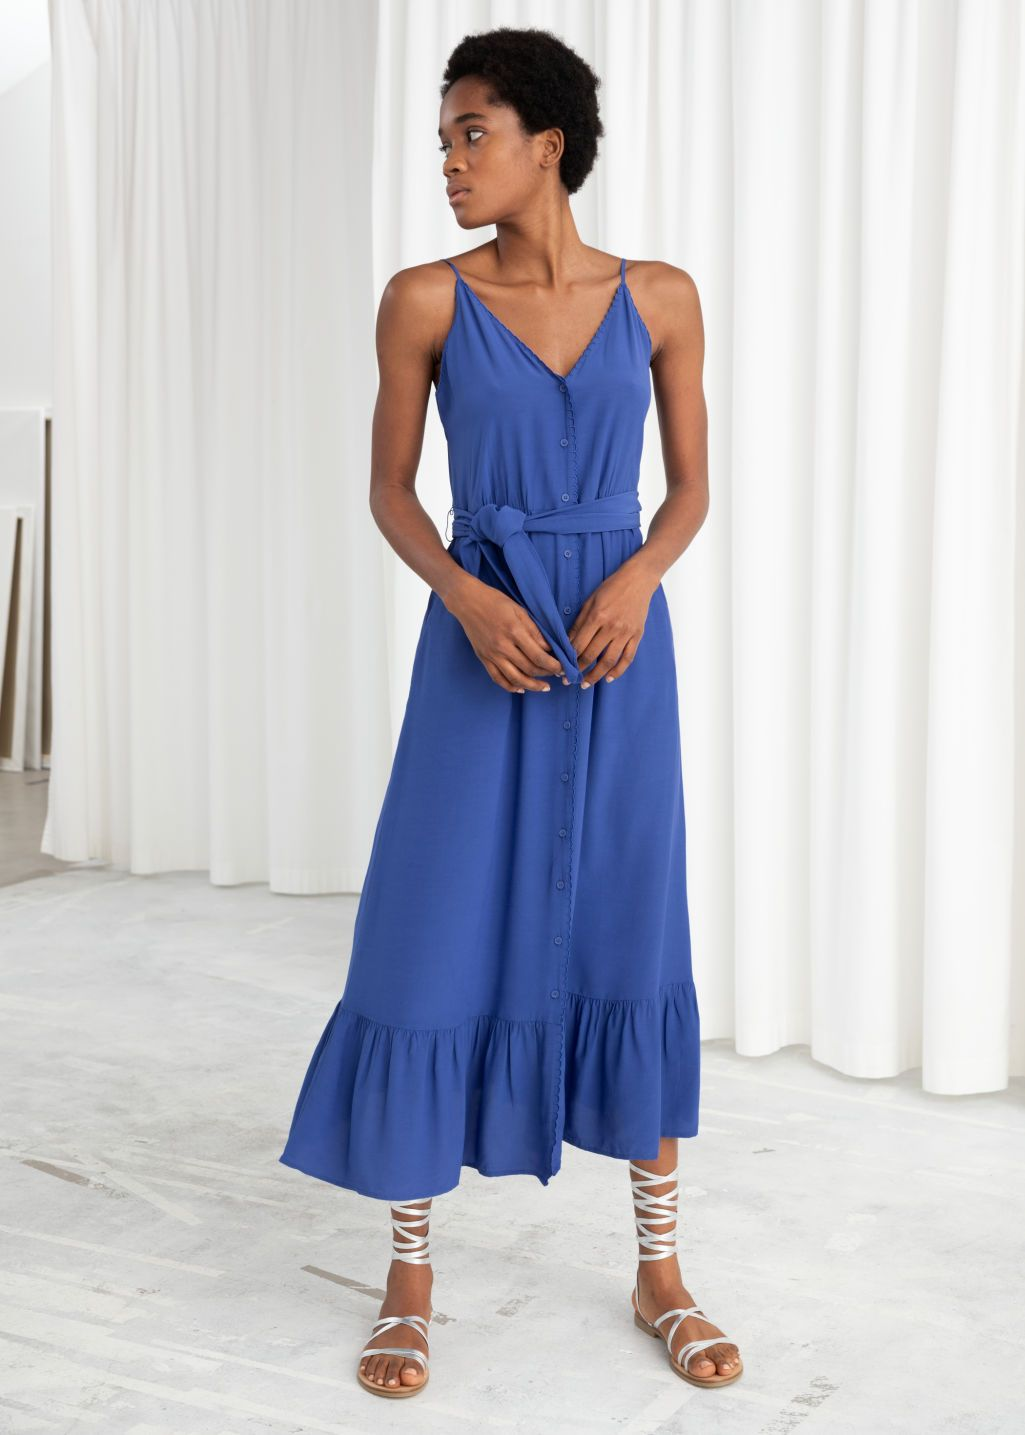 Belted Button Up Midi Dress Blue Midi Dresses Other Stories Dresses Midi Dress Cotton Wrap Dress [ 1435 x 1025 Pixel ]